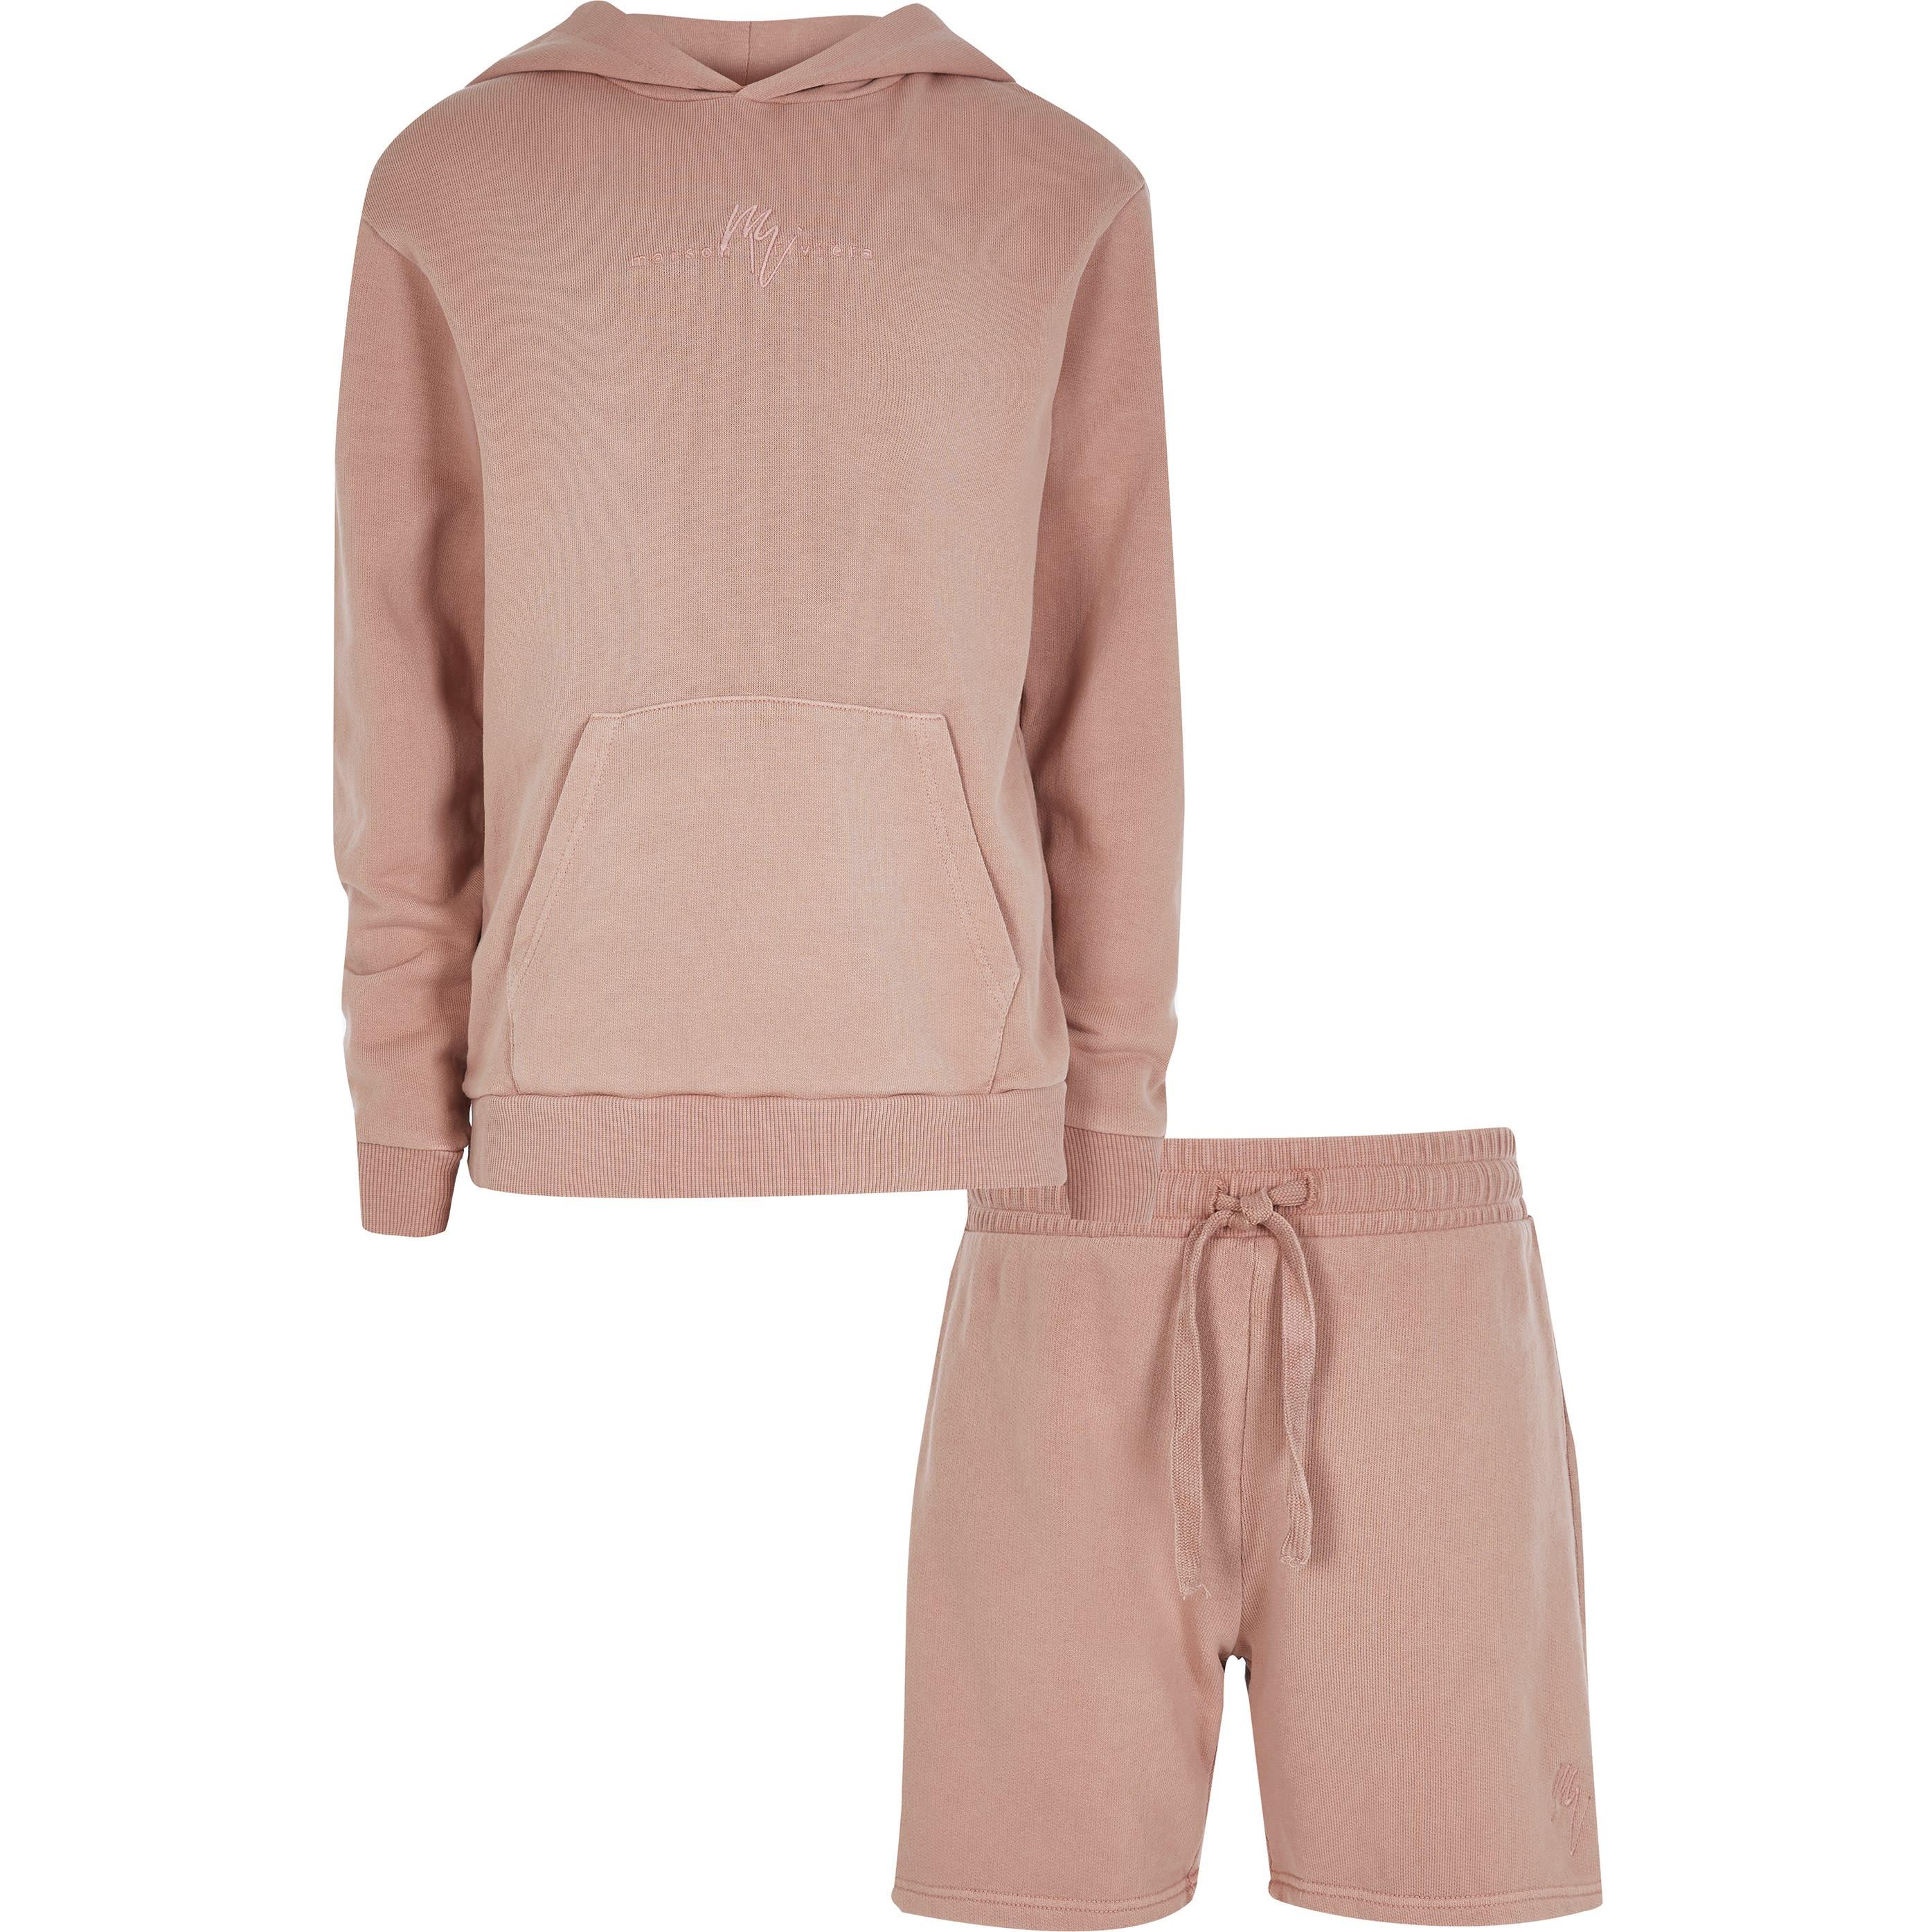 river island Boys Pink washed Hoody Set (9-10 Yrs)